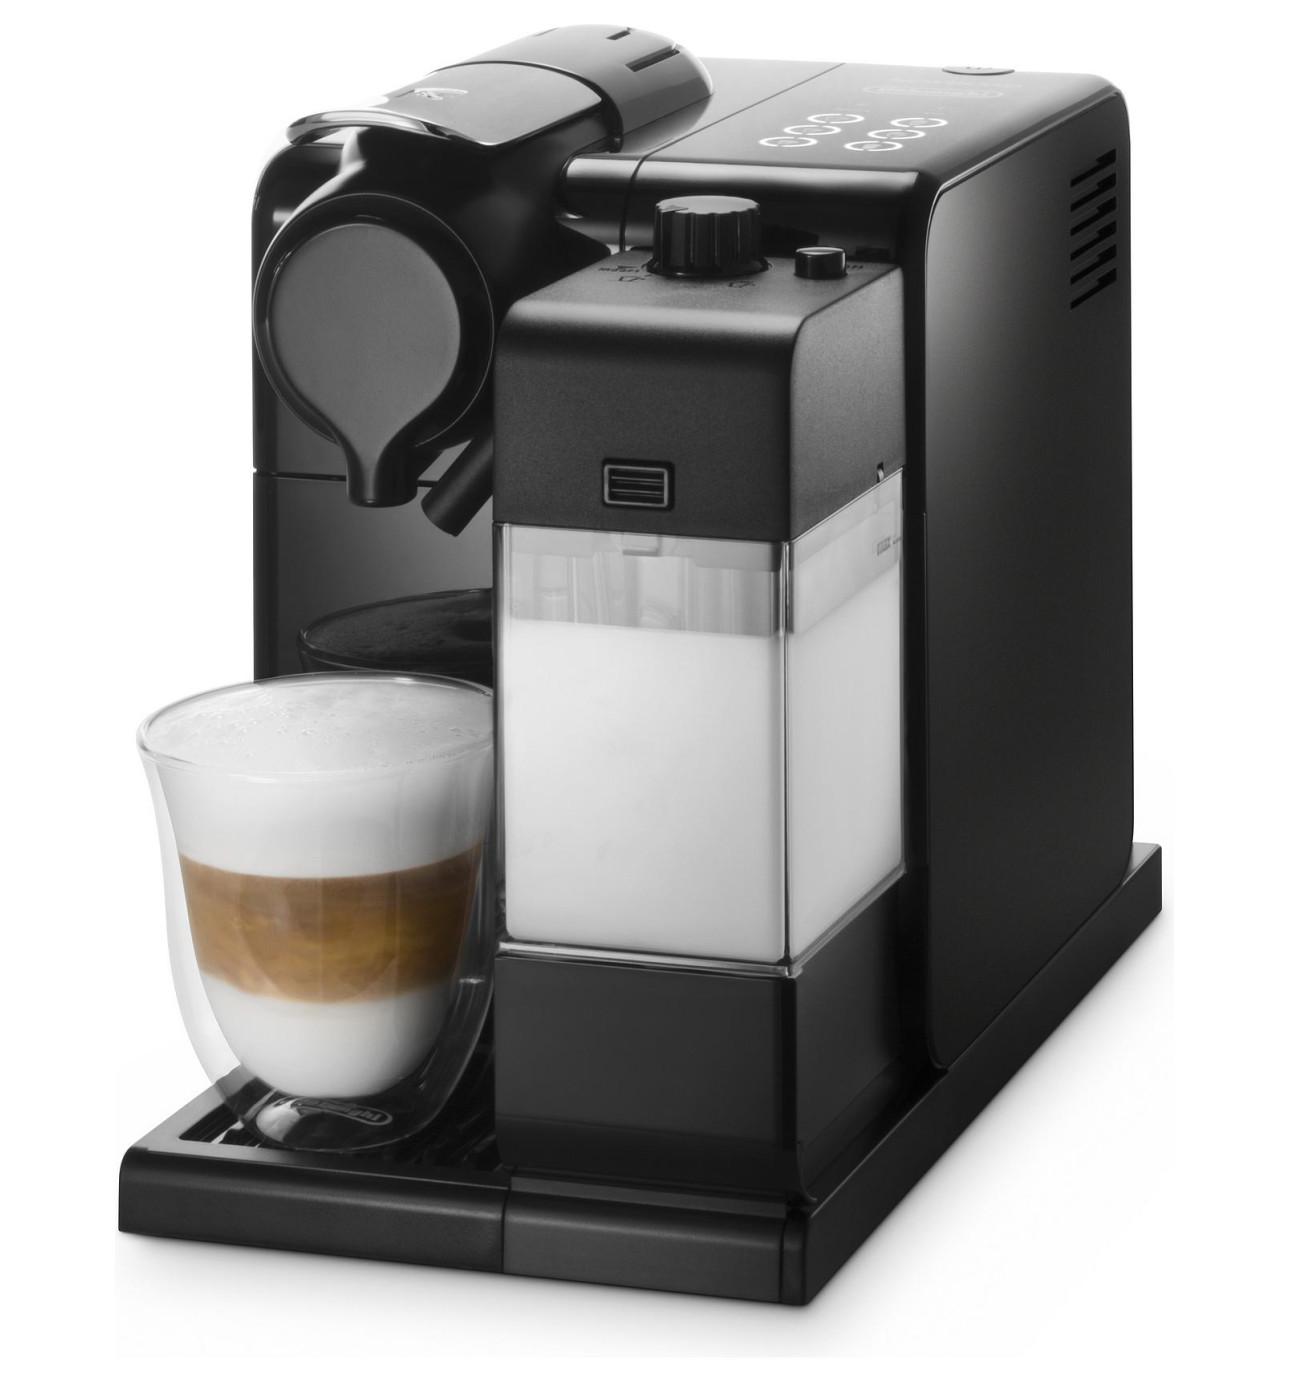 Electronic David Jones Coffee Machines nespresso coffee machines david jones en550b lattissima touch in black